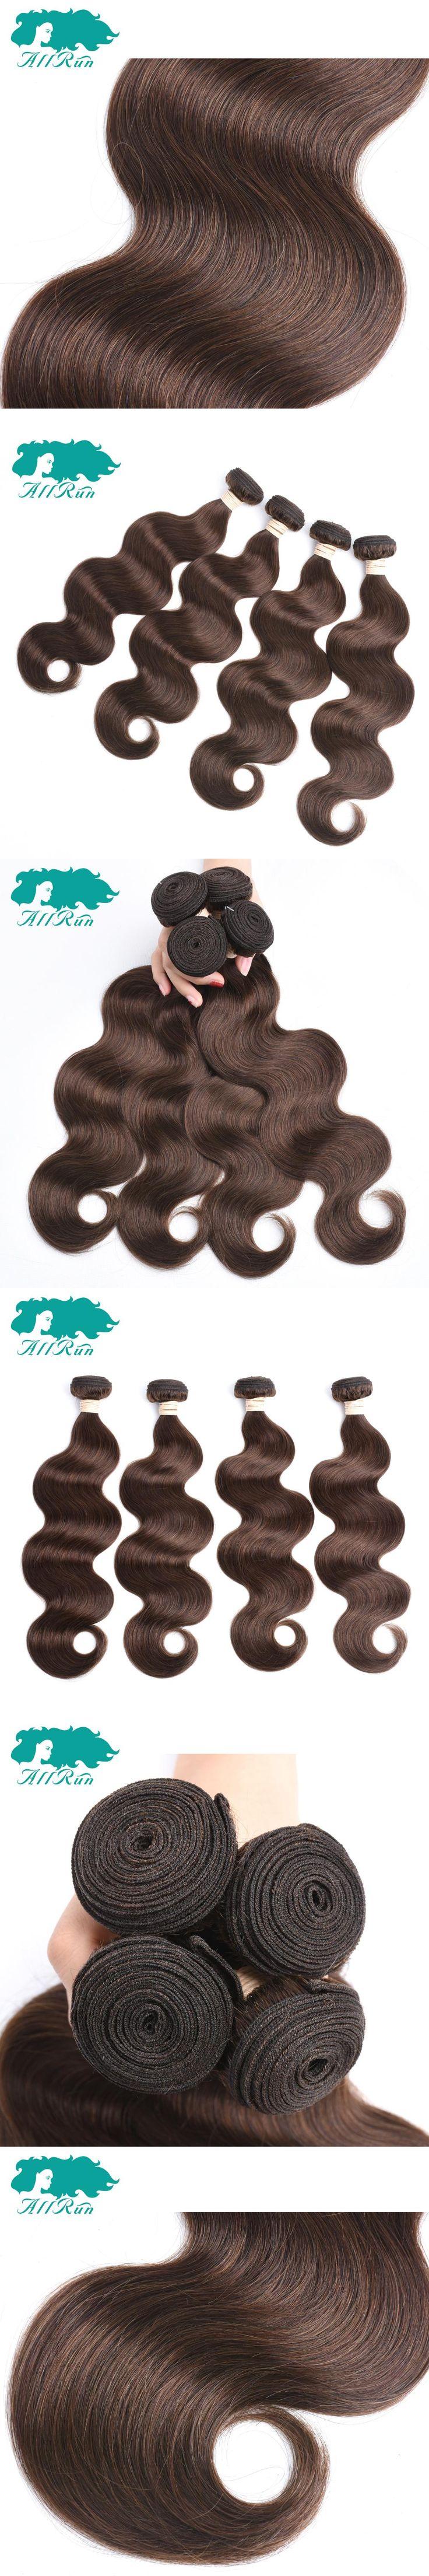 Allrun Pre-Colored Peruvian Body Wave 4# Light Brown None Remy Peruvian Hair Bundles 100% Human Hair Weave 4pc/lot Free Shipping